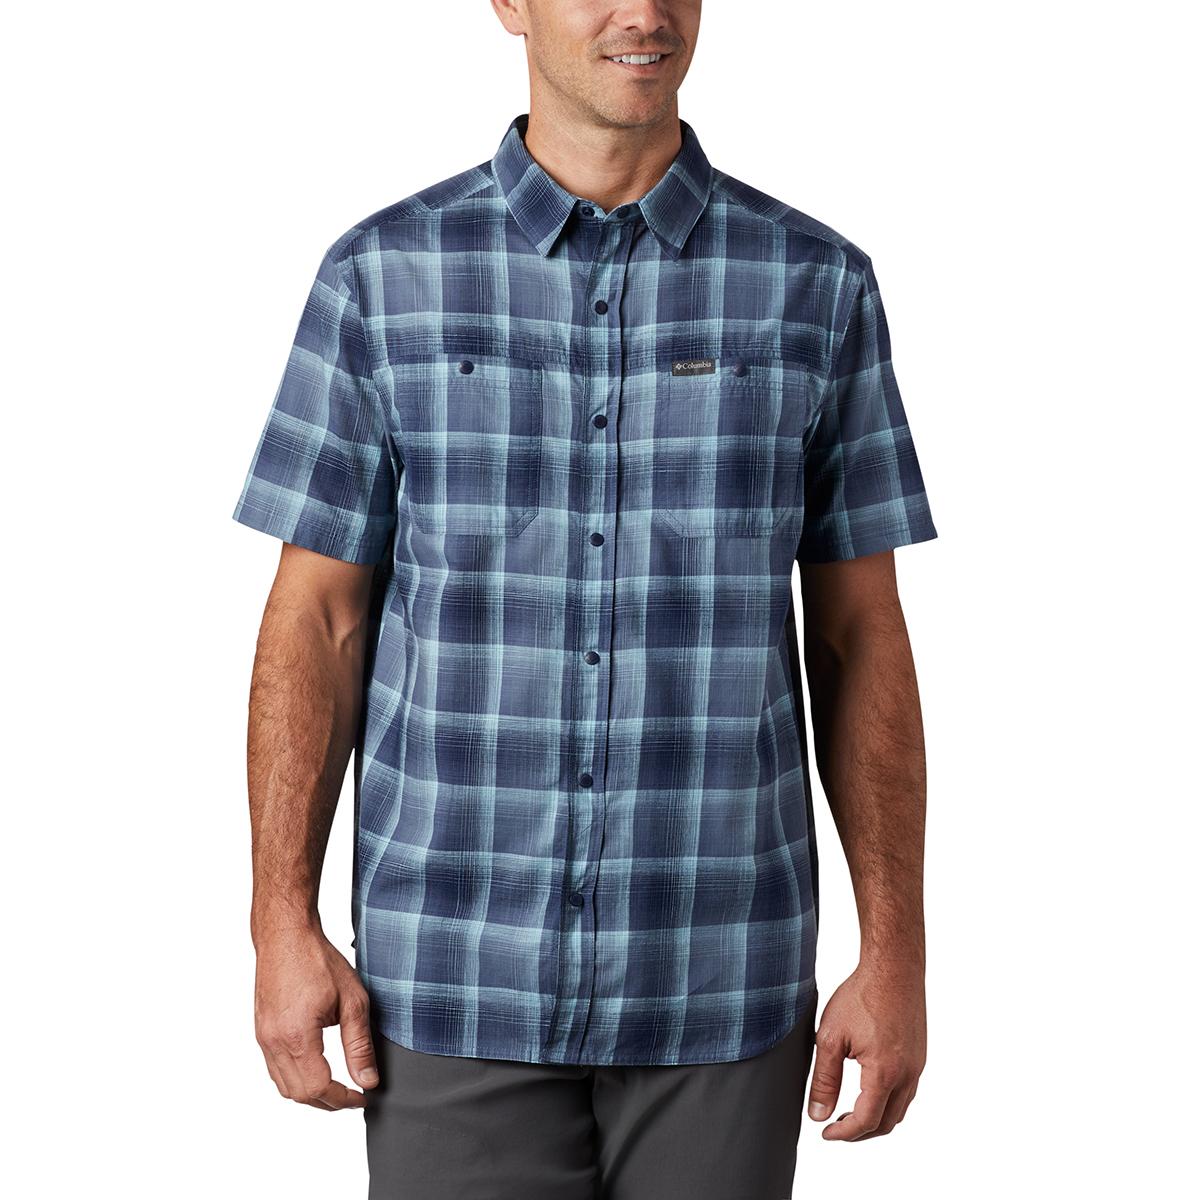 Columbia Men's Short-Sleeve Leadville Ridge Ii Button-Down Shirt - Blue, M